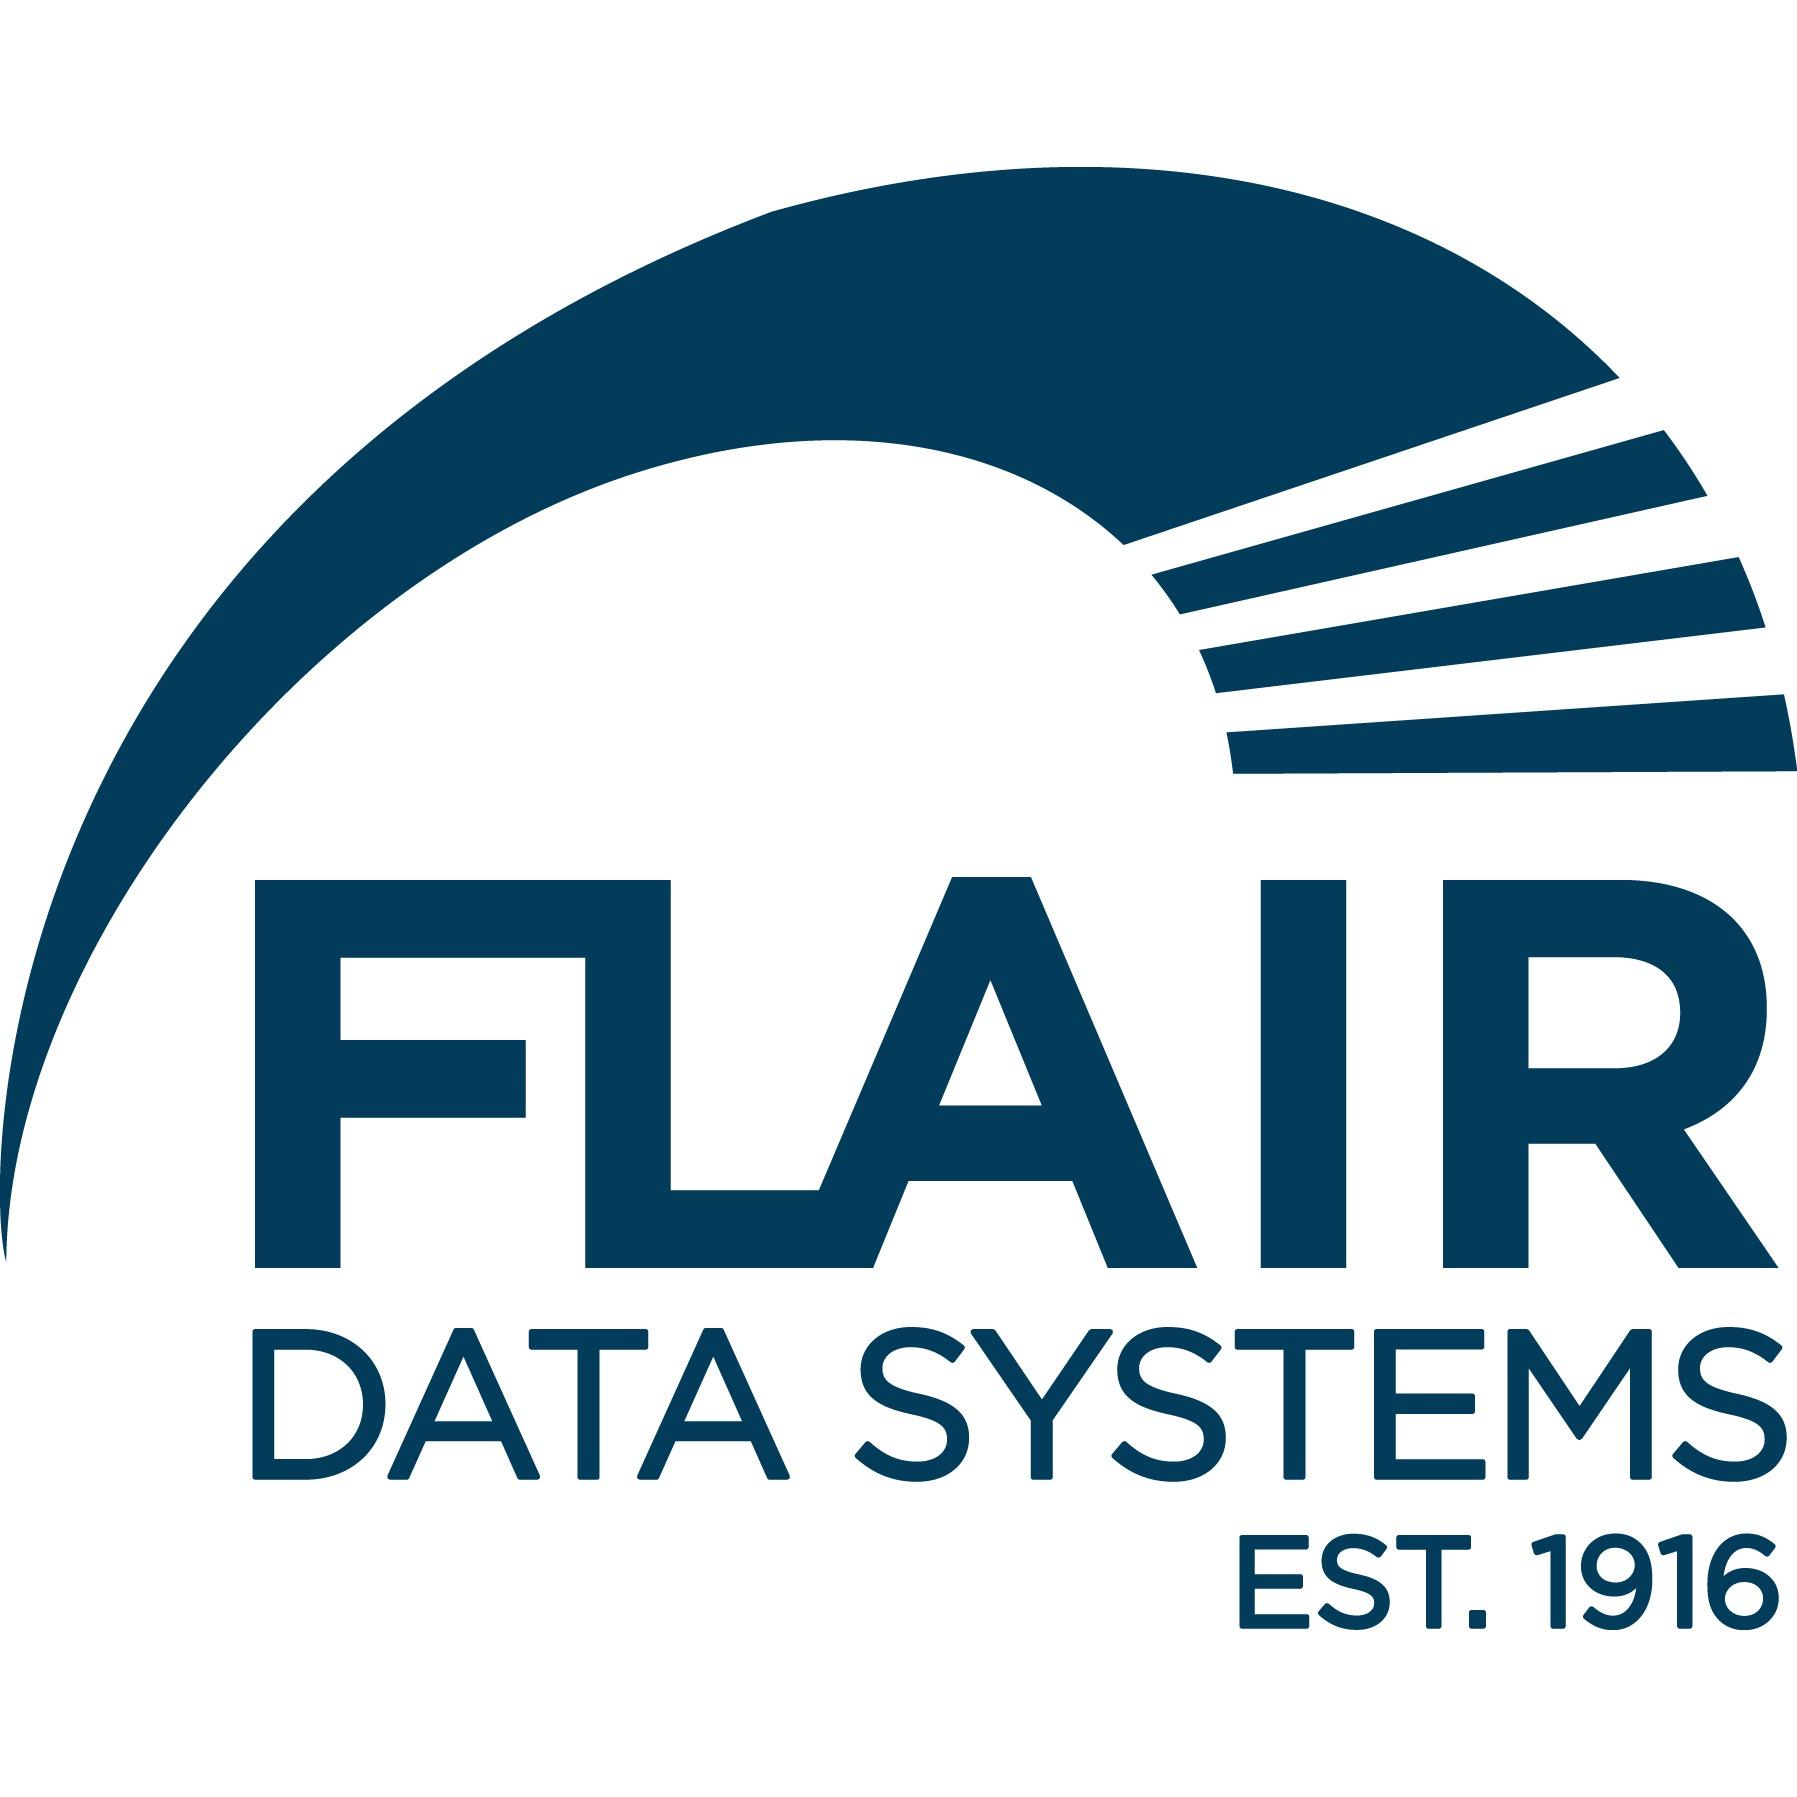 Flair Data Systems